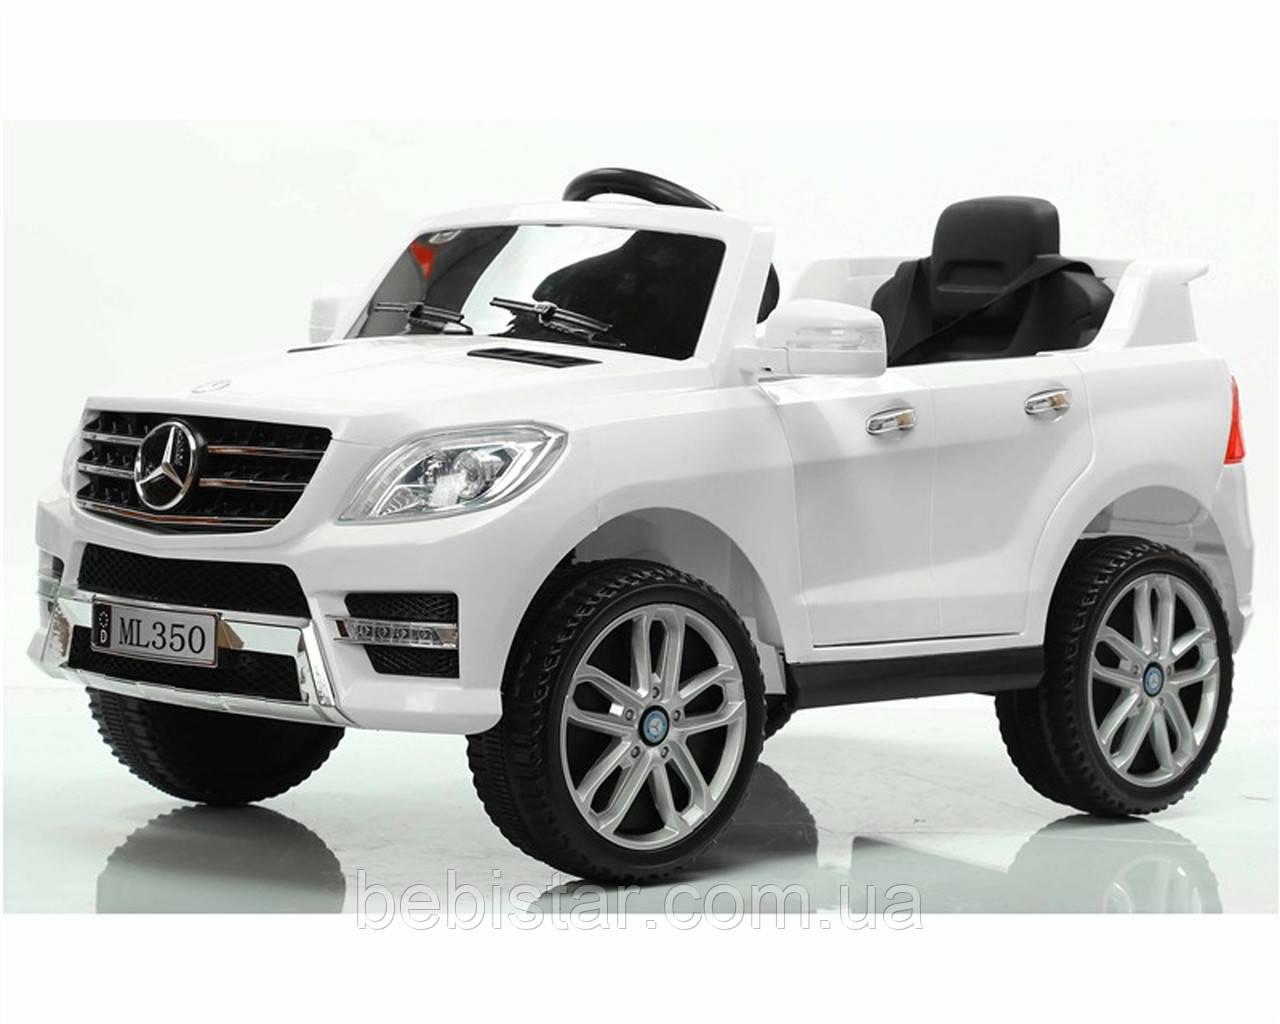 Детский электромобиль белый Джип Т-7829 WHITE мотор 1*25W аккумулятор 6V4.5AH деткам 3-8 лет с МР3